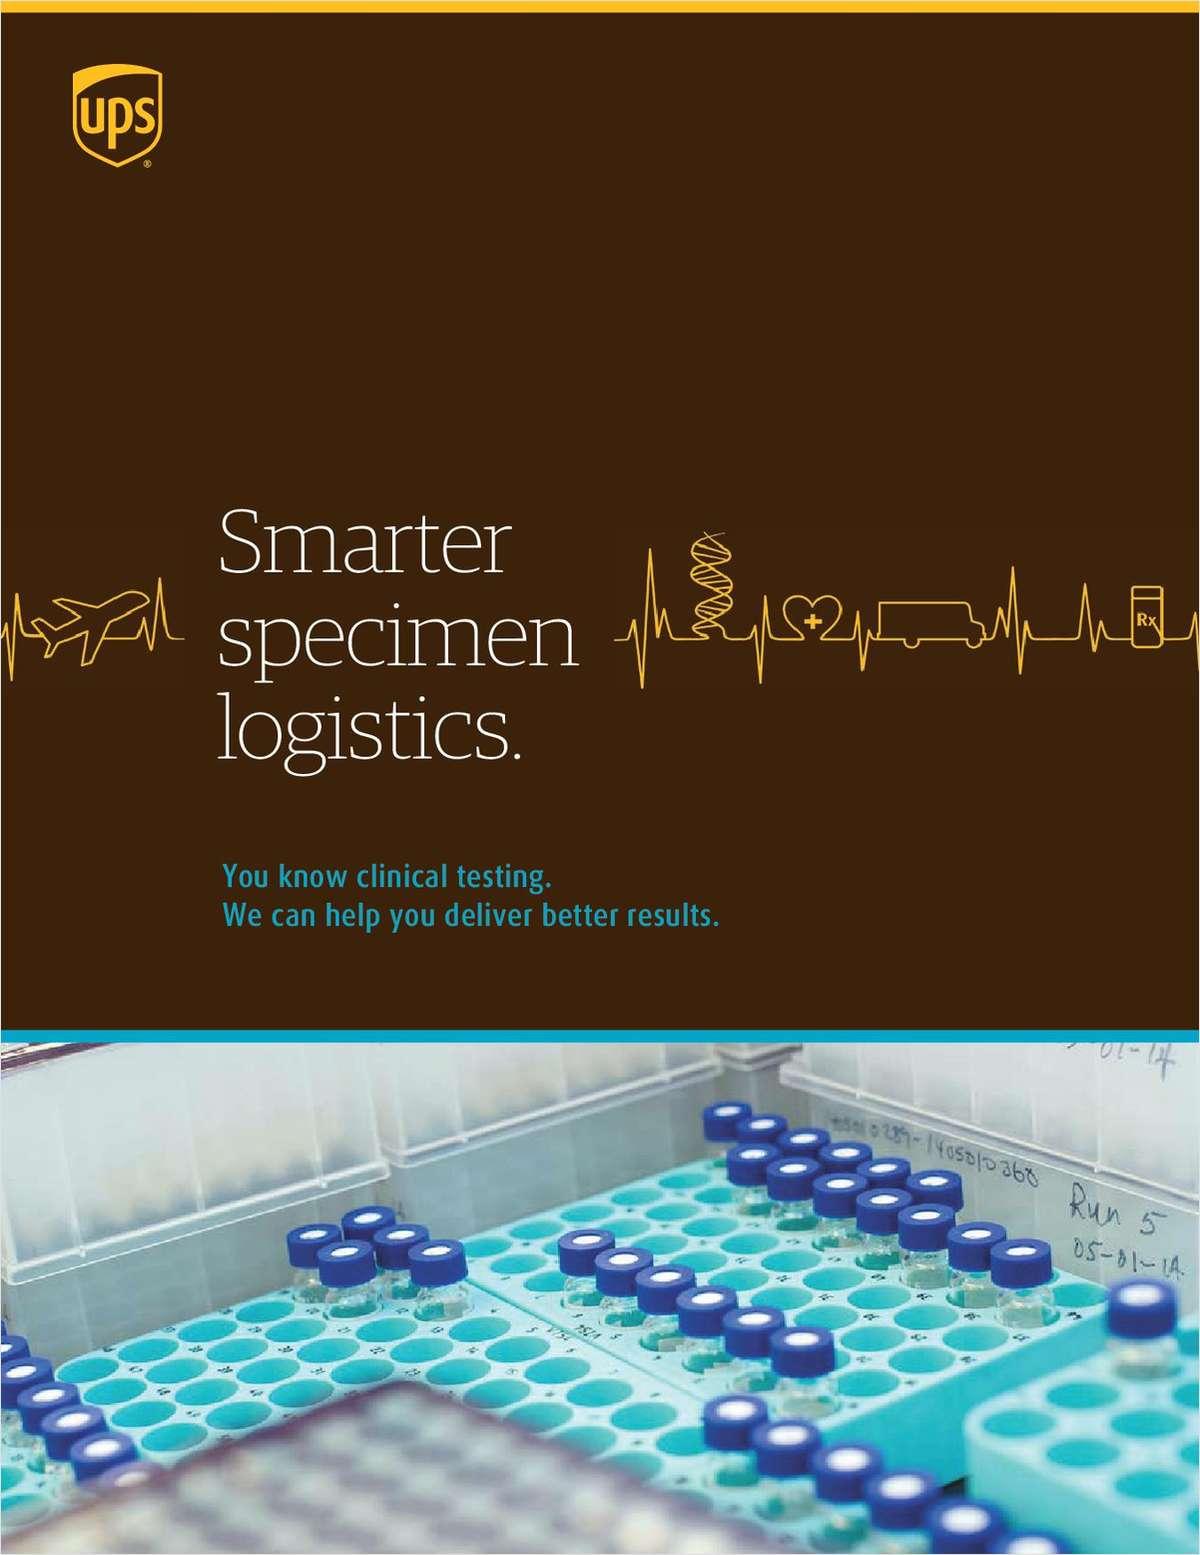 UPS Smarter Specimen Logistics